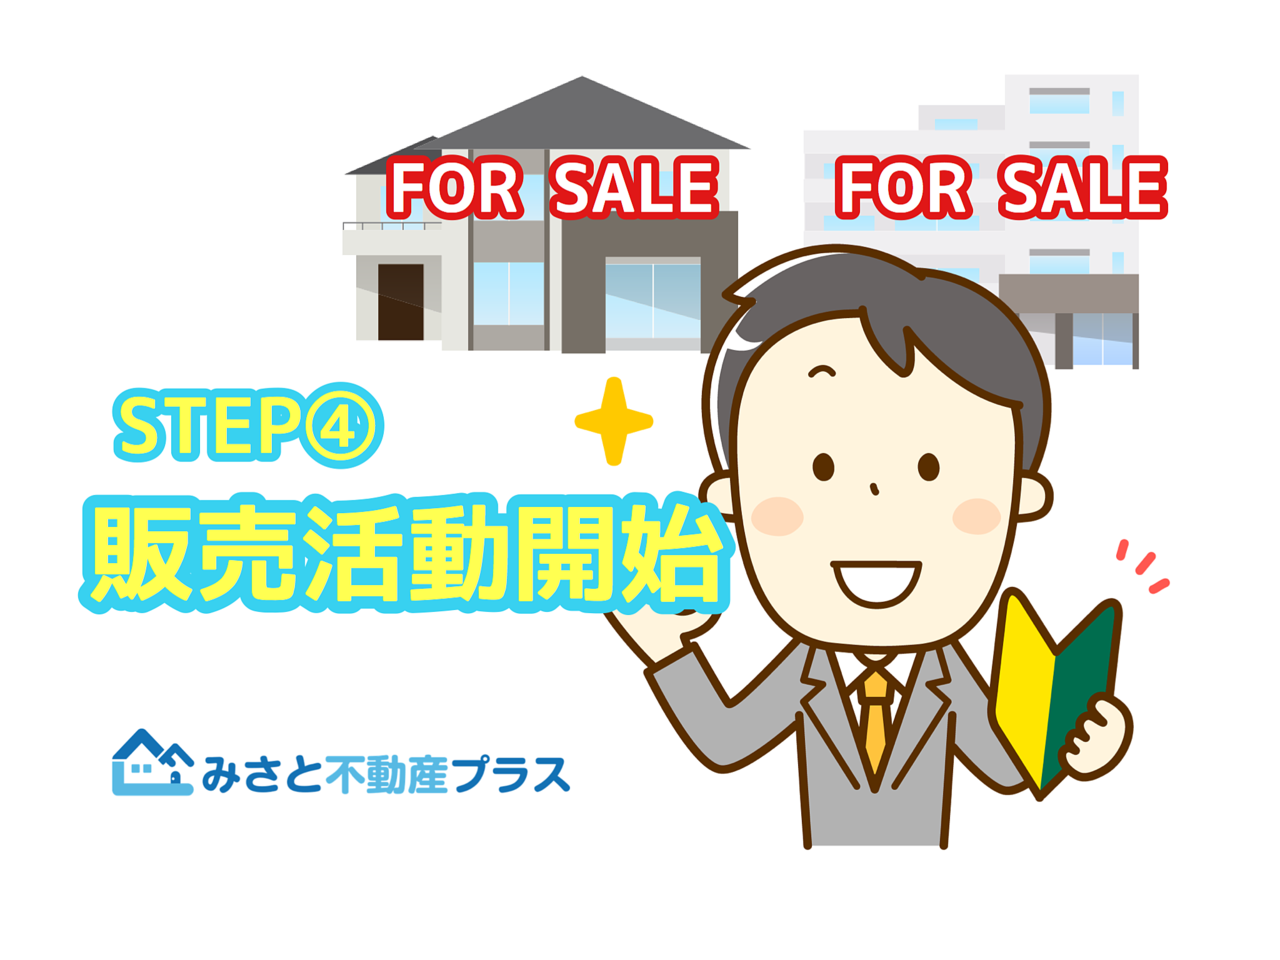 STEP④販売活動開始